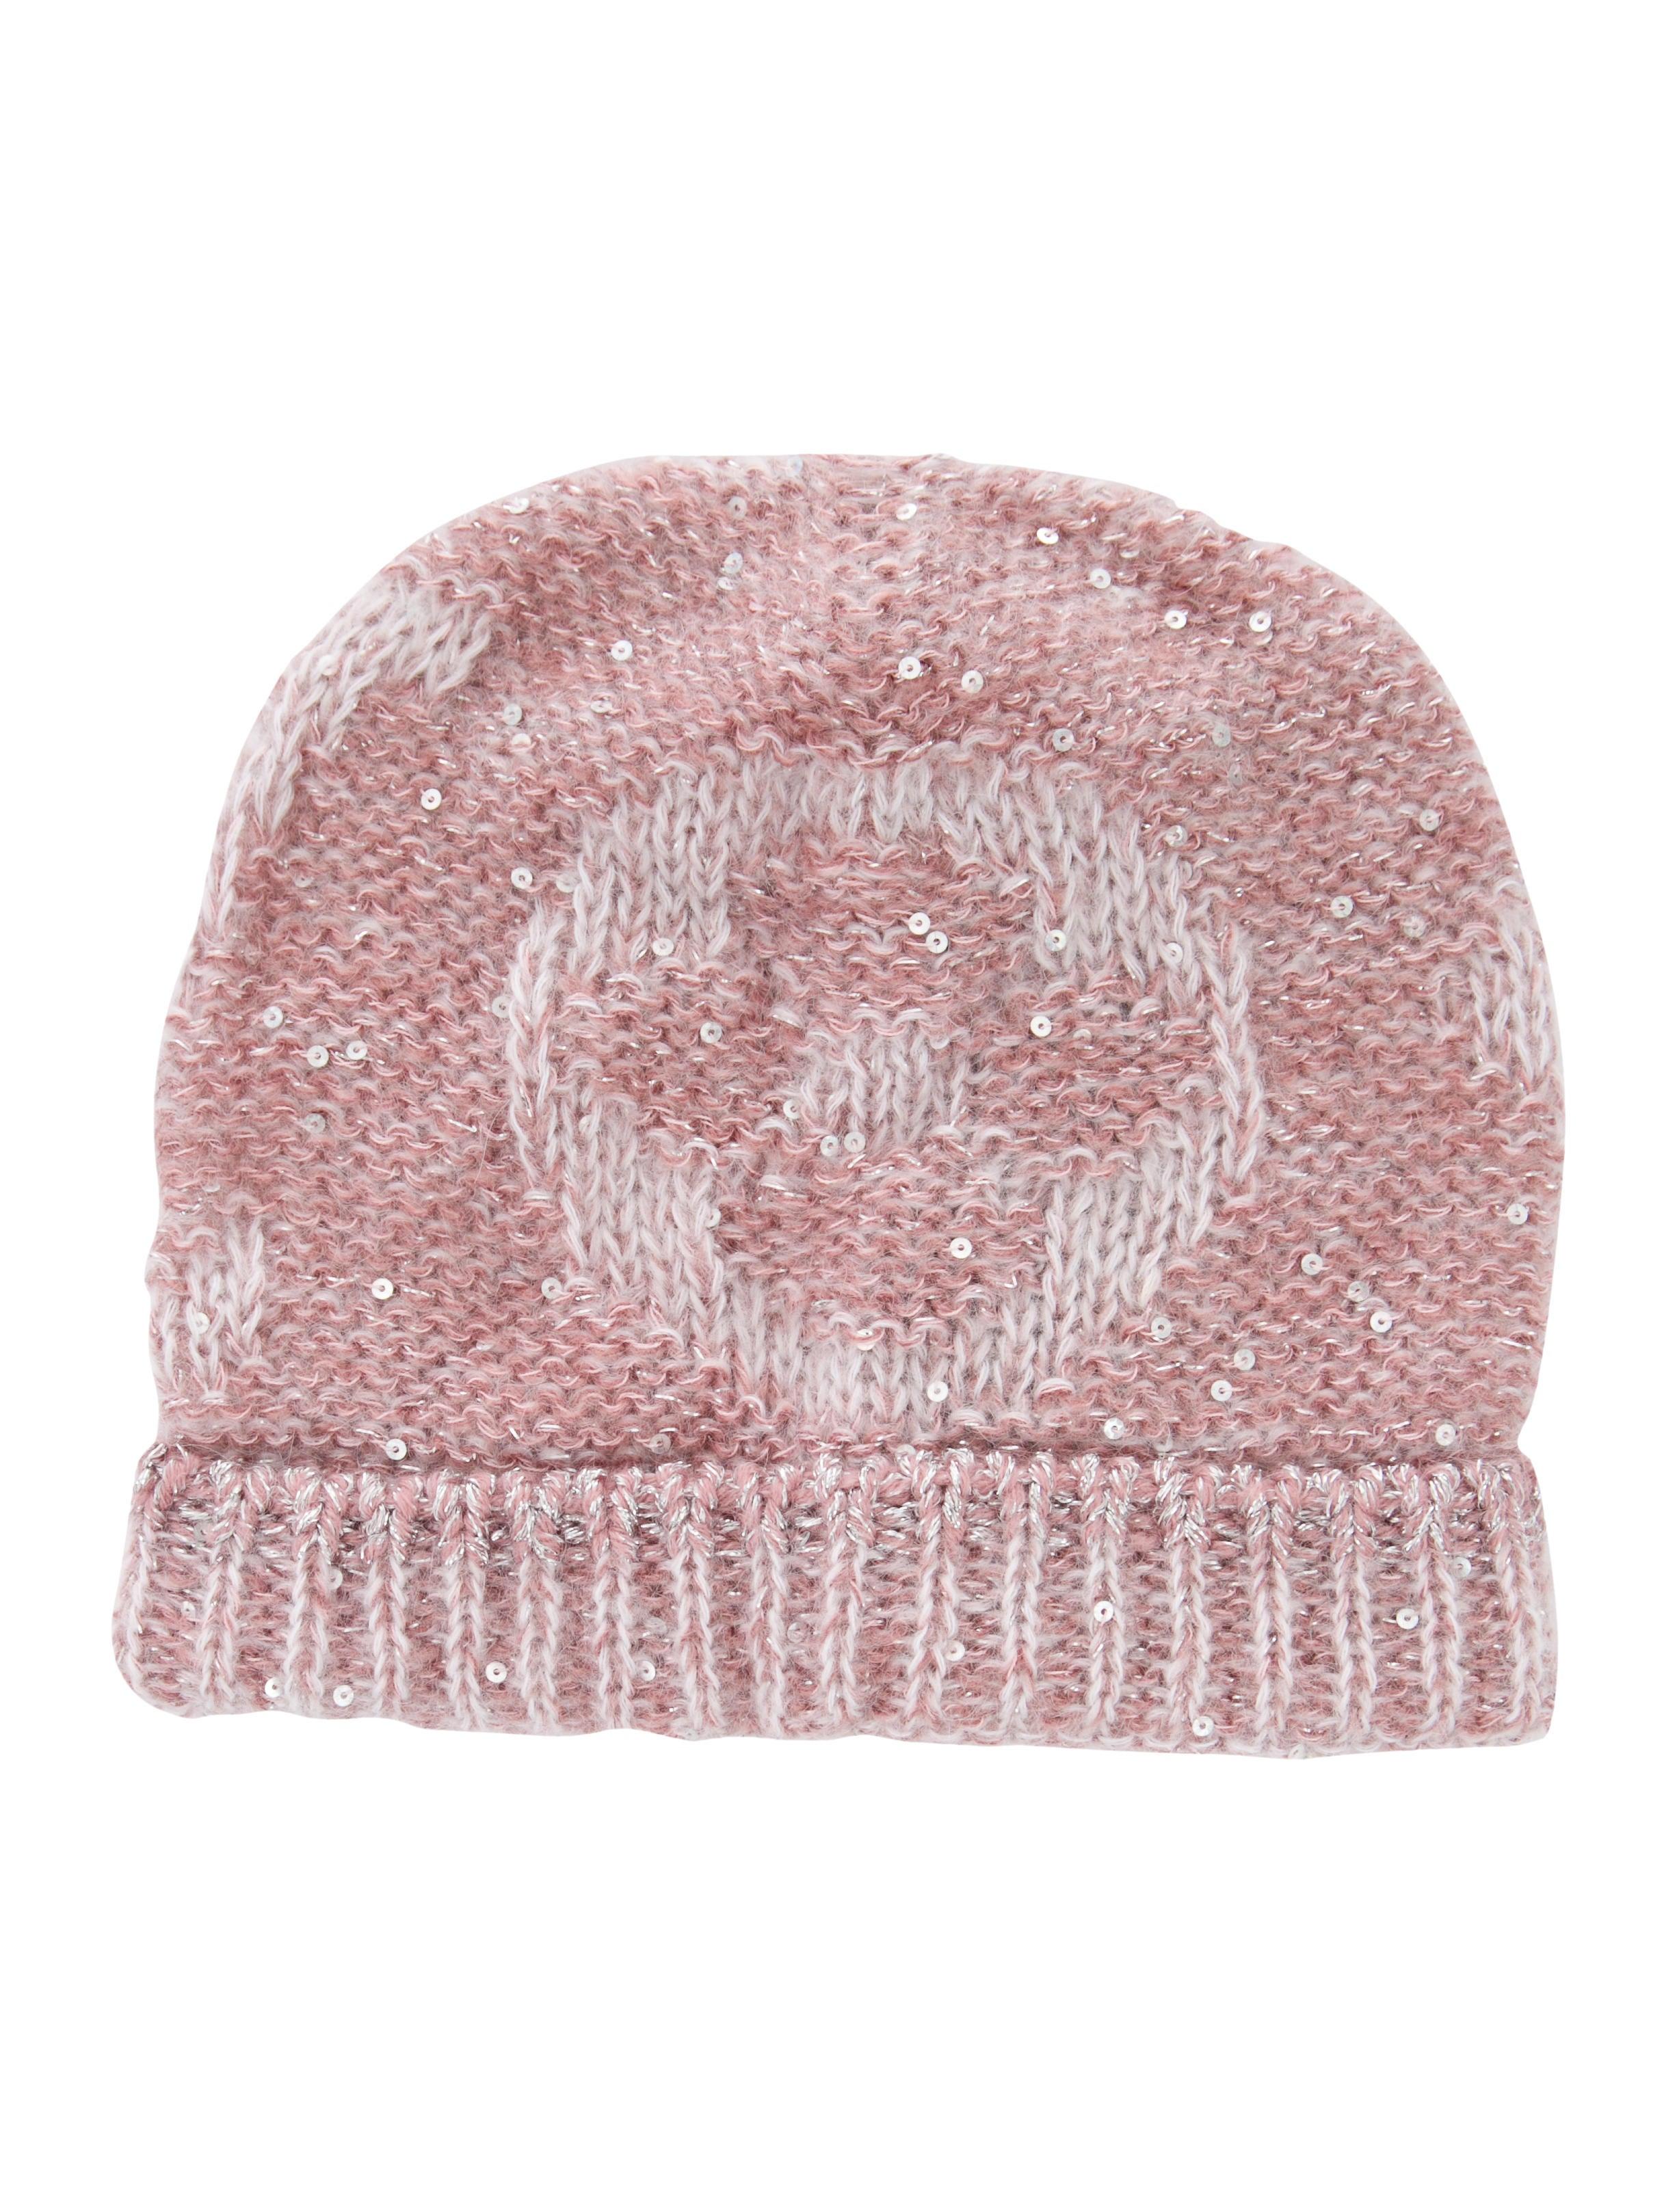 Louis Vuitton Monogram Glitter Sunset Beanie Hat w  Tags ... 5d6eb6ab658